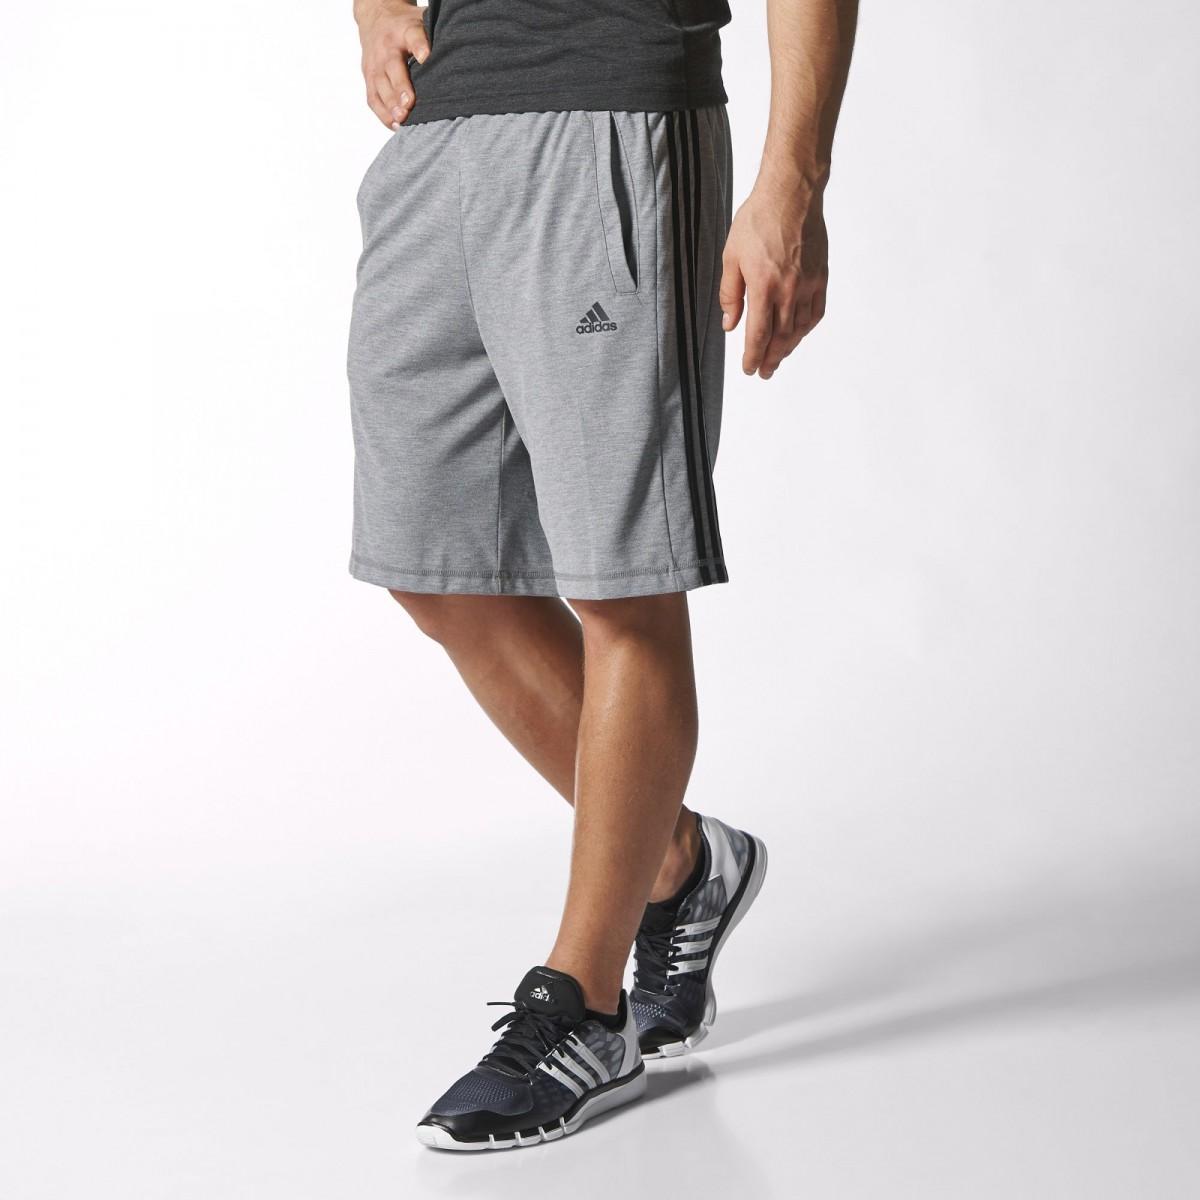 b5946b60232 Bizz Store - Shorts Masculino Adidas Ess Moletom Cinza